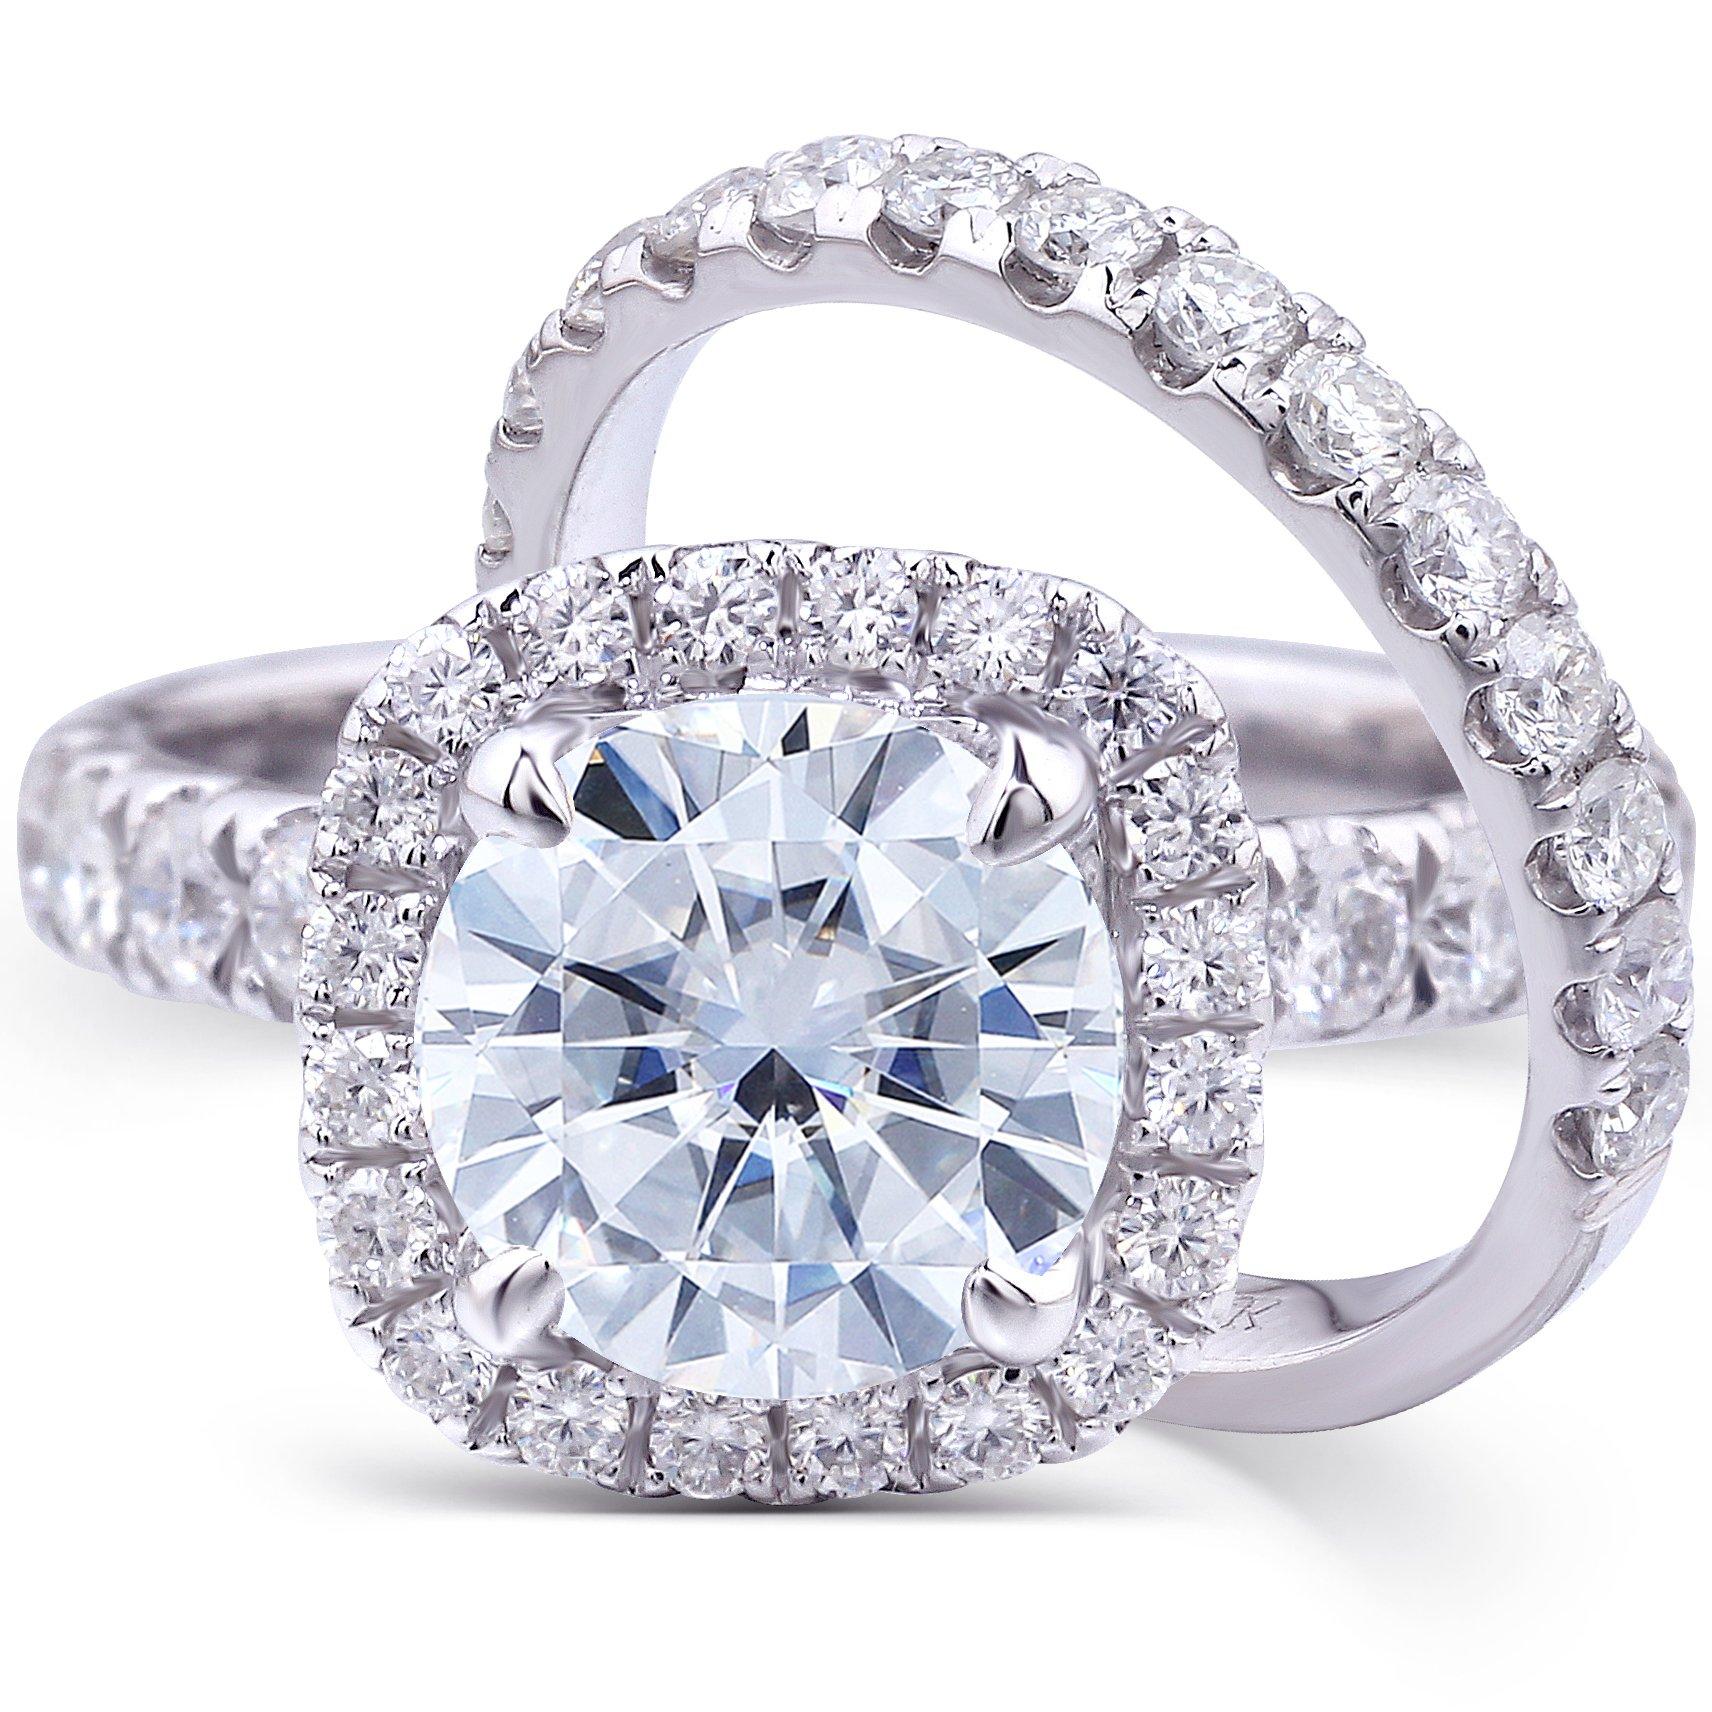 Round-cut Moissanite & Lab Diamond Accent Wedding Ring Set 3 Carat (ctw) in 14k White Gold (2 Piece Set) (7)